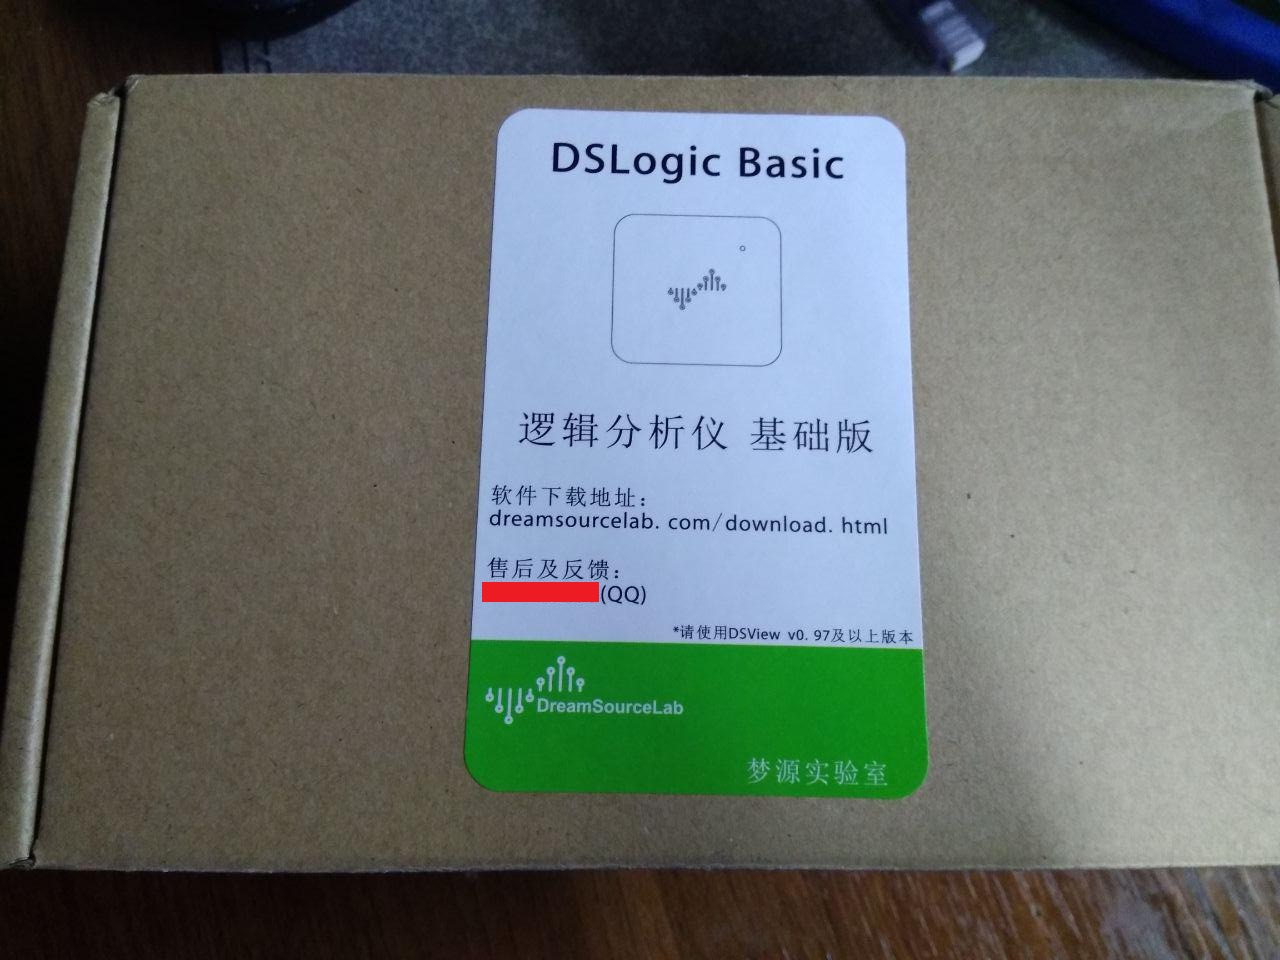 Превращаем DSLogic Basic в DSLogic Plus - 2